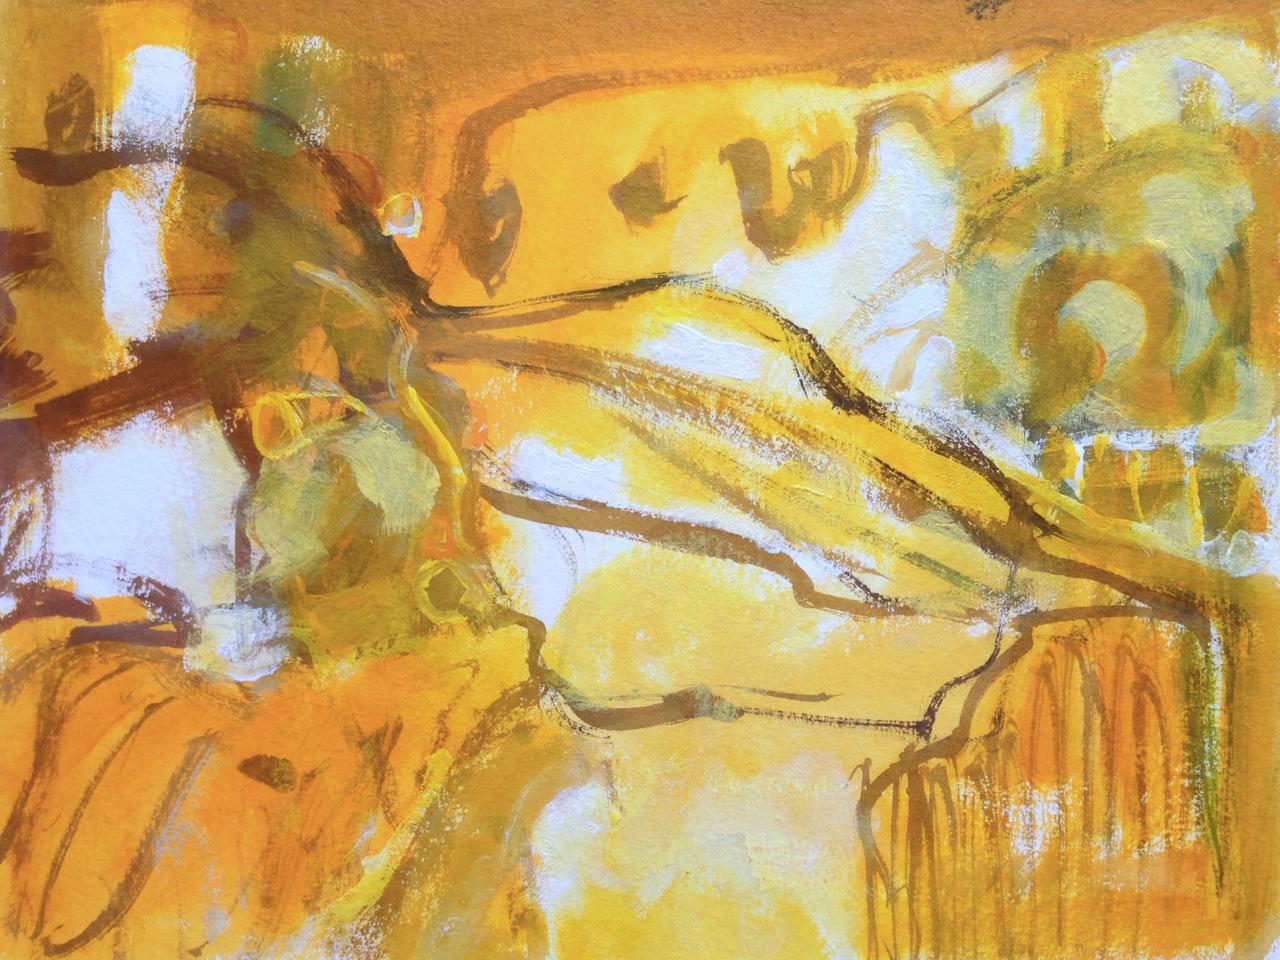 Sphagnum and Sticks, Kirkconnell Flow